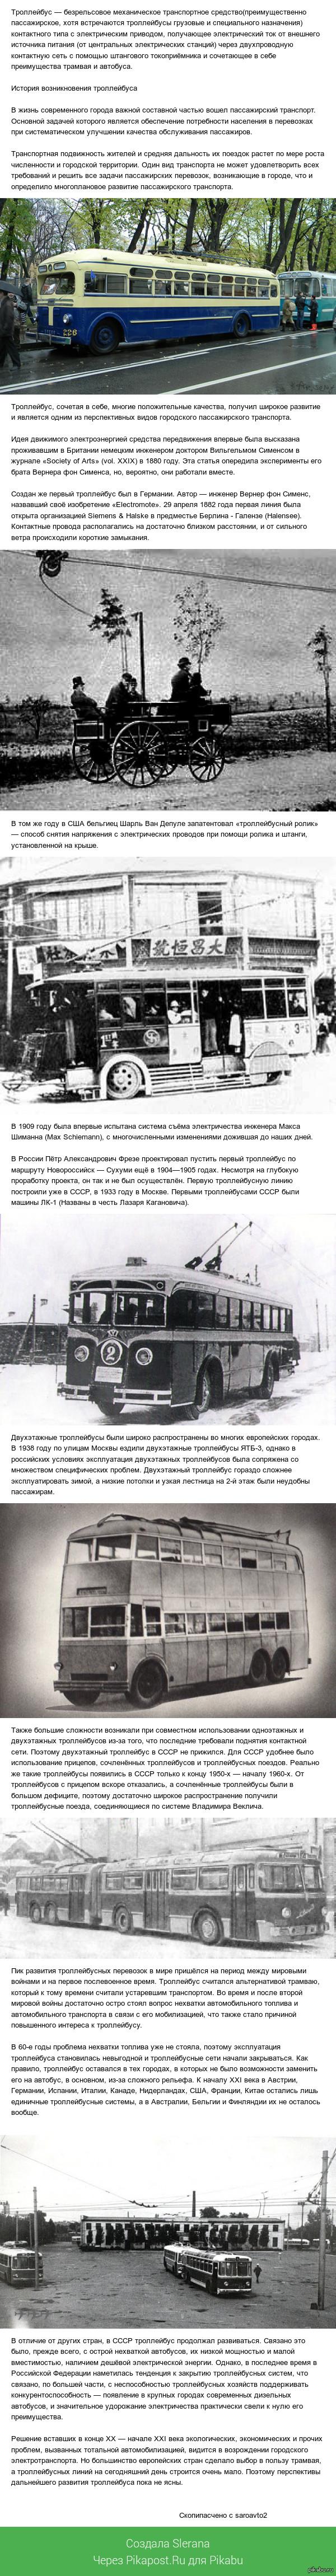 Все о троллейбусе (Часть 1)